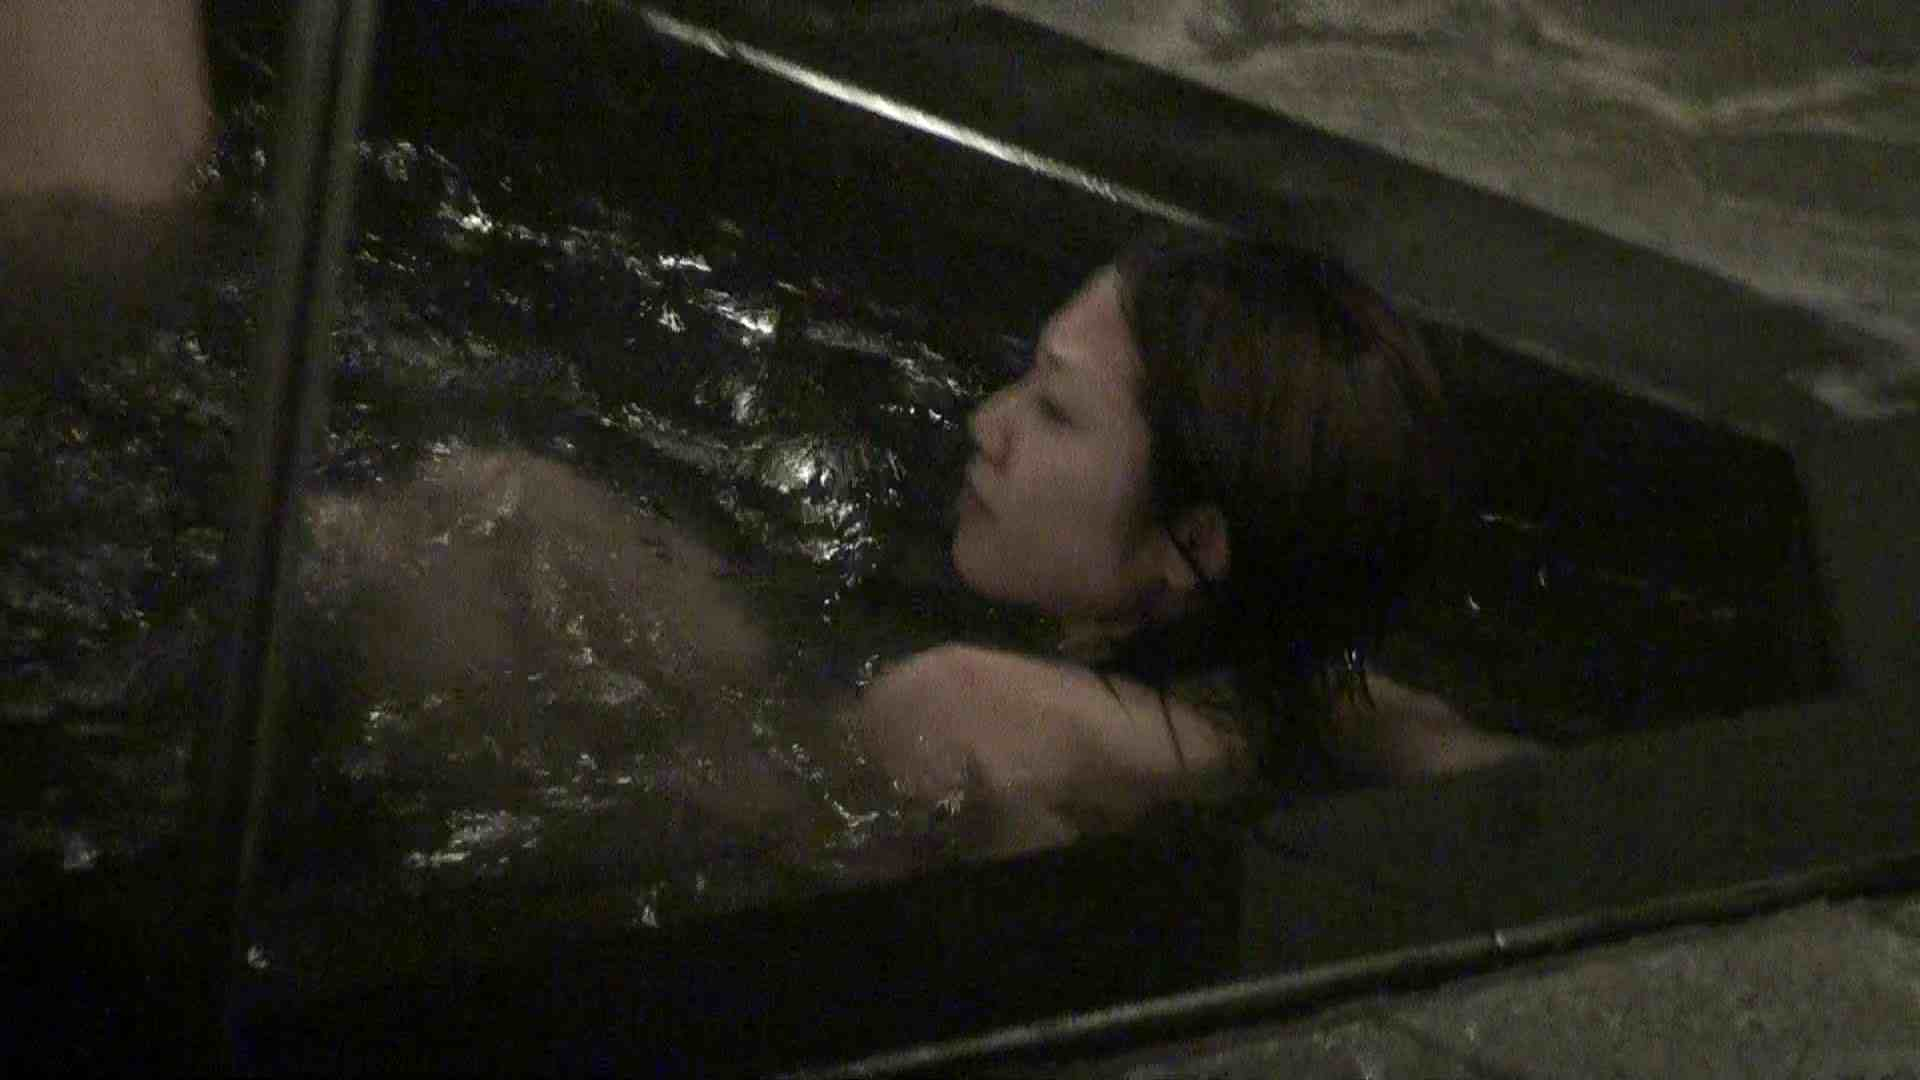 Aquaな露天風呂Vol.411 盗撮 | HなOL  49pic 16